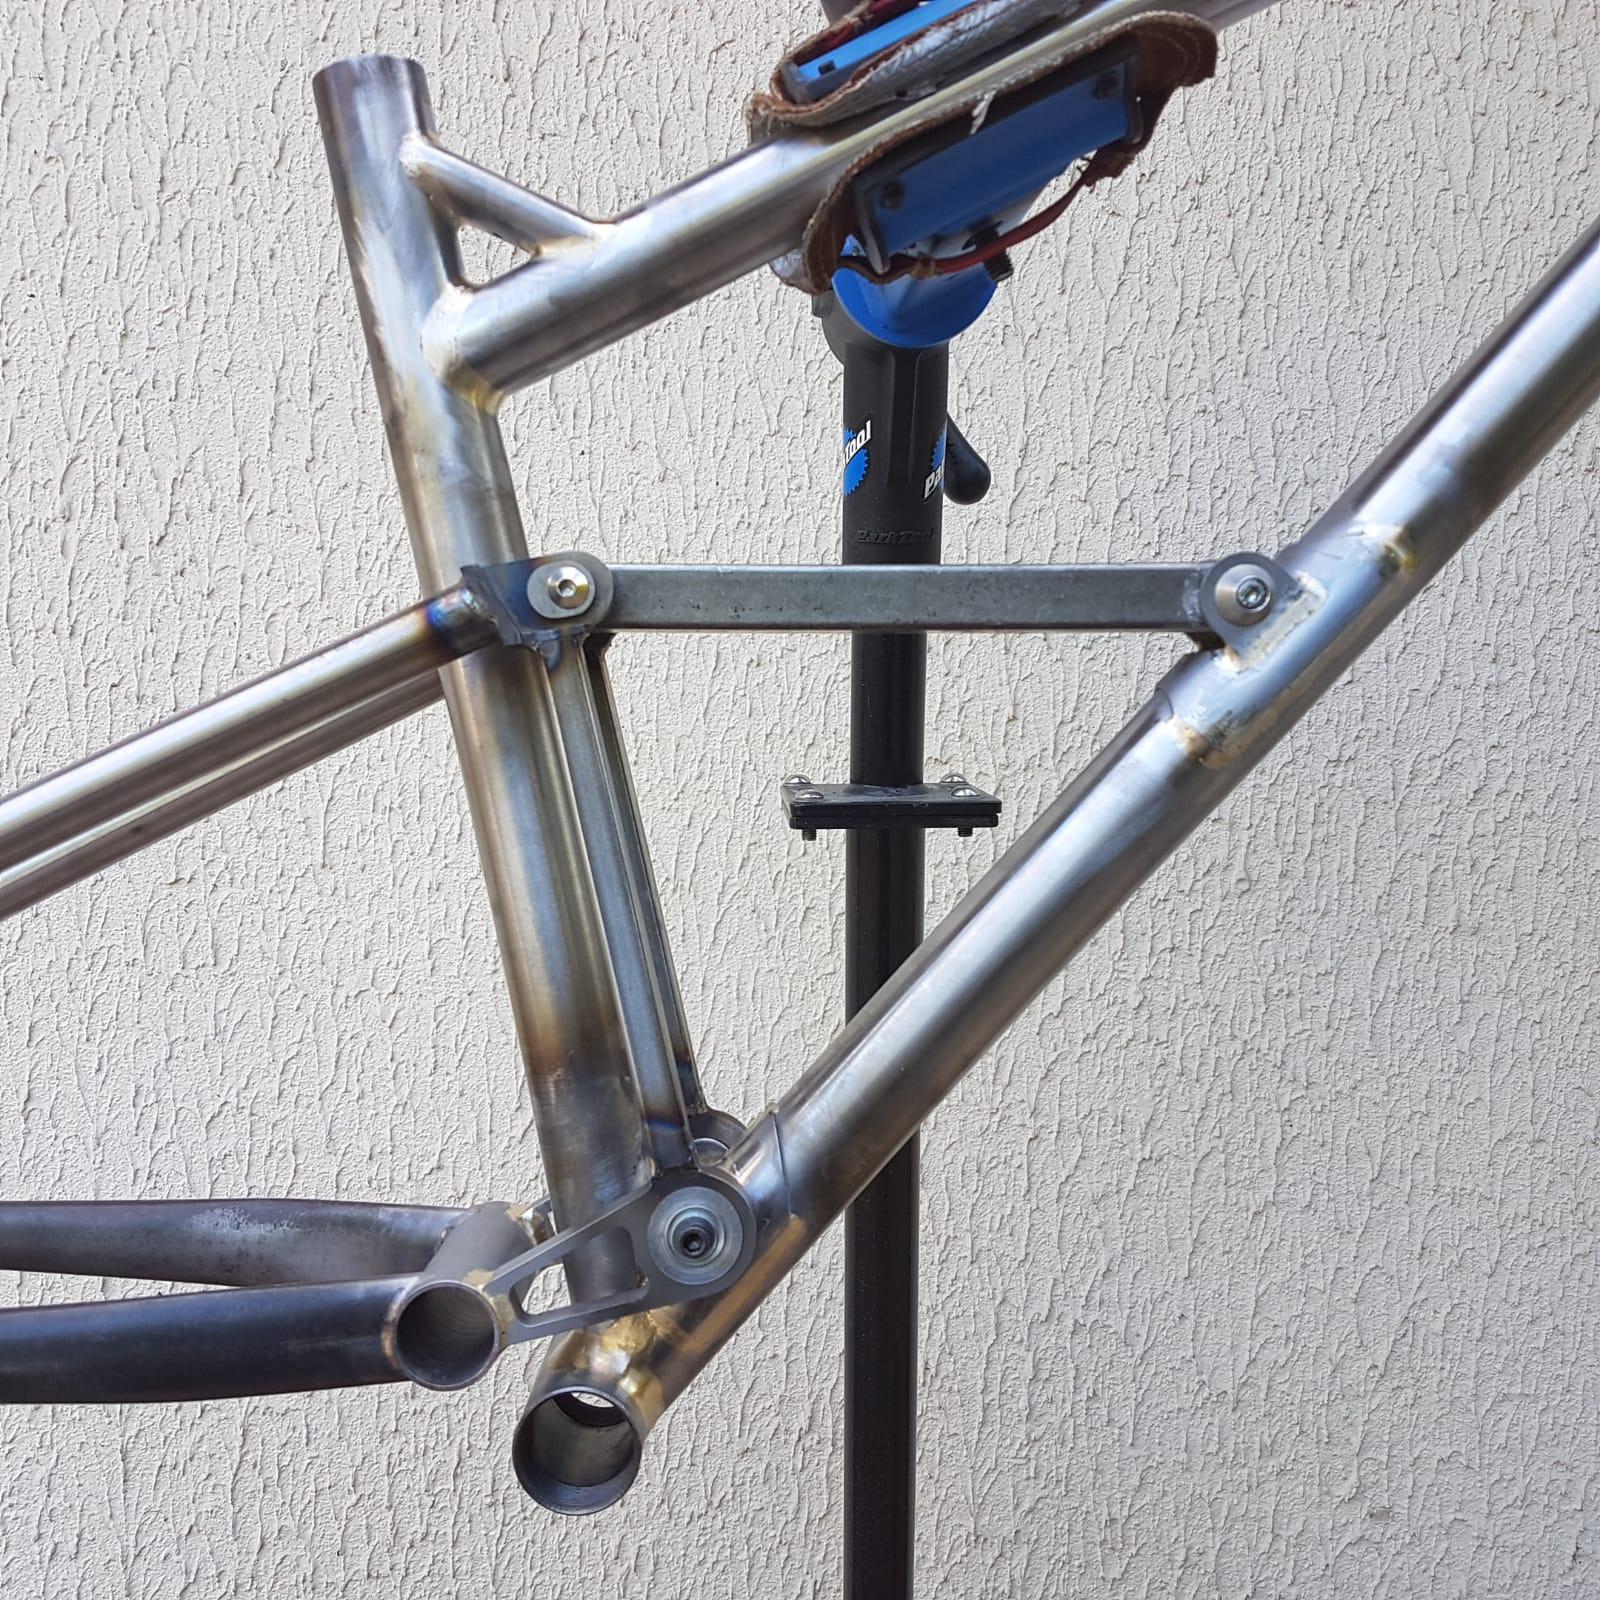 Baudou_bikes_tout_suspendu_Pivot